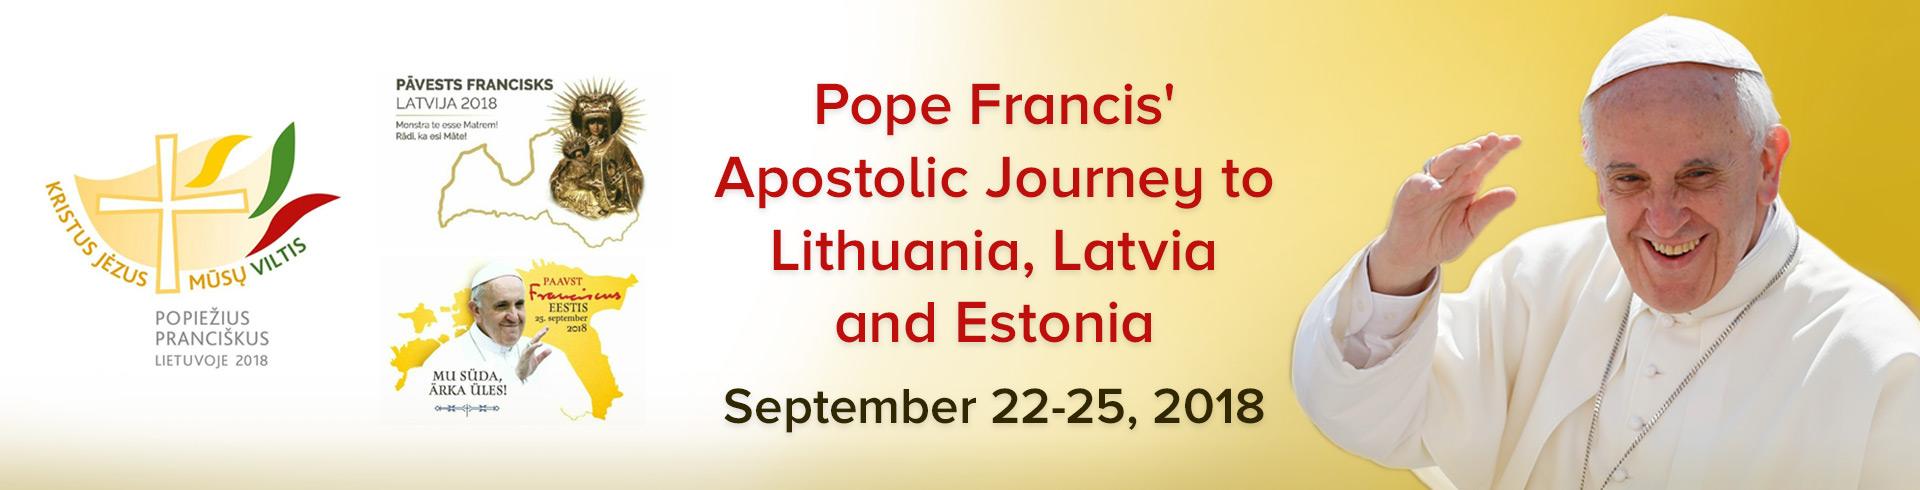 Apostolic Visit 2018 to Baltics